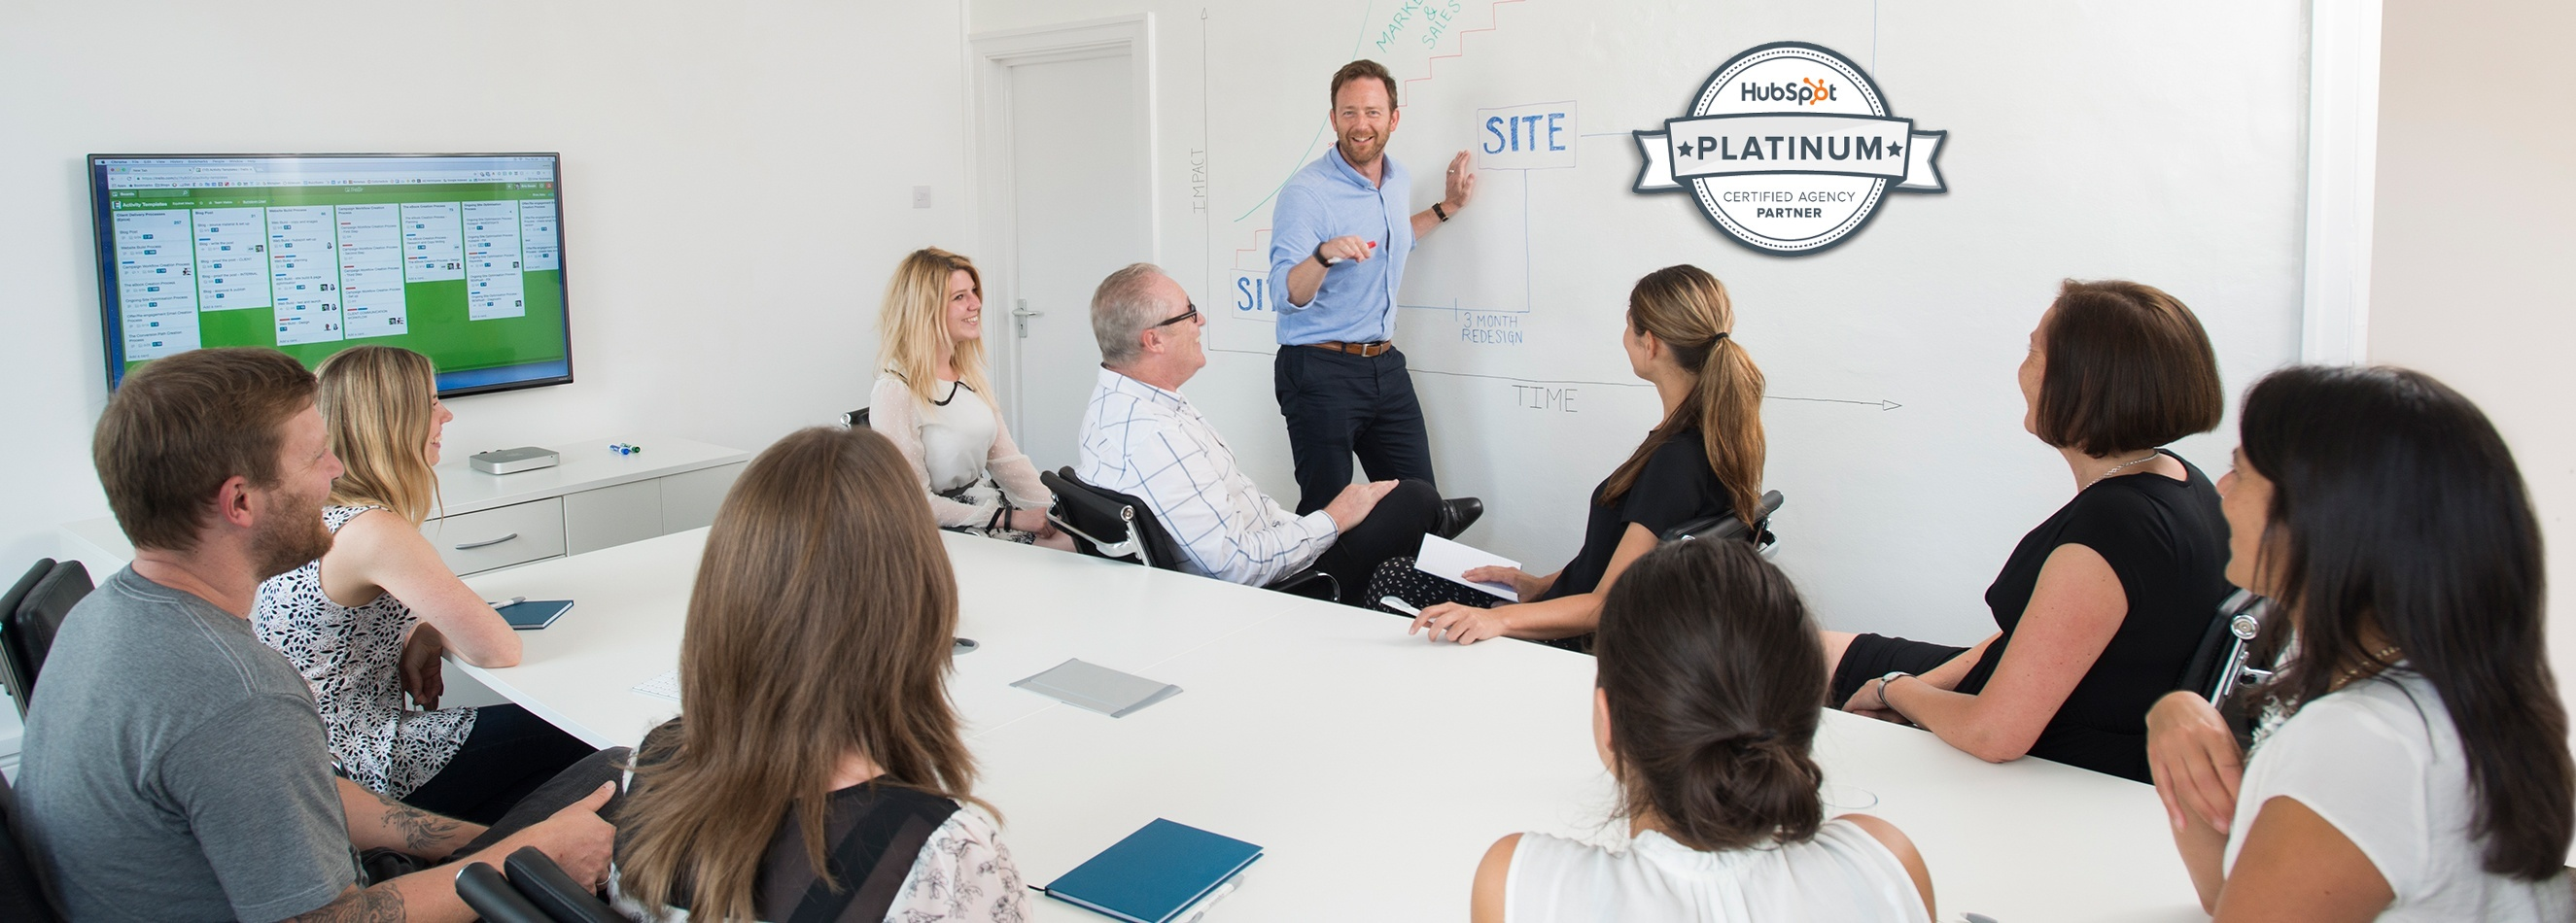 Hubspot platinum partner uk inbound marketing agency